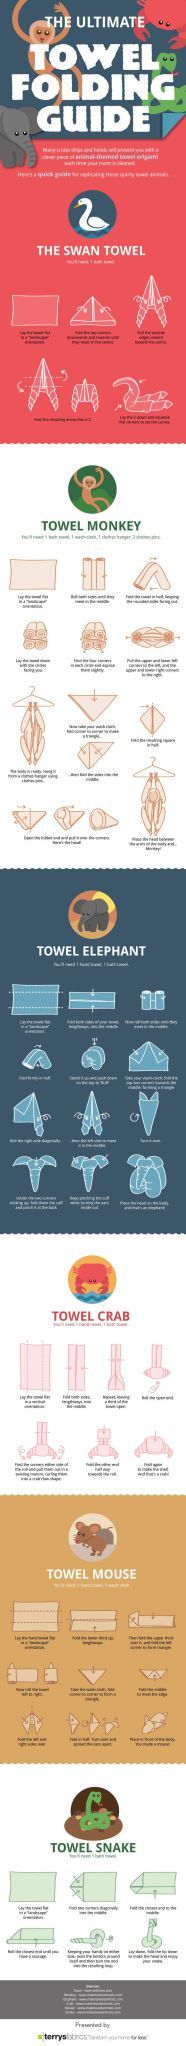 Cruise Towel Animals